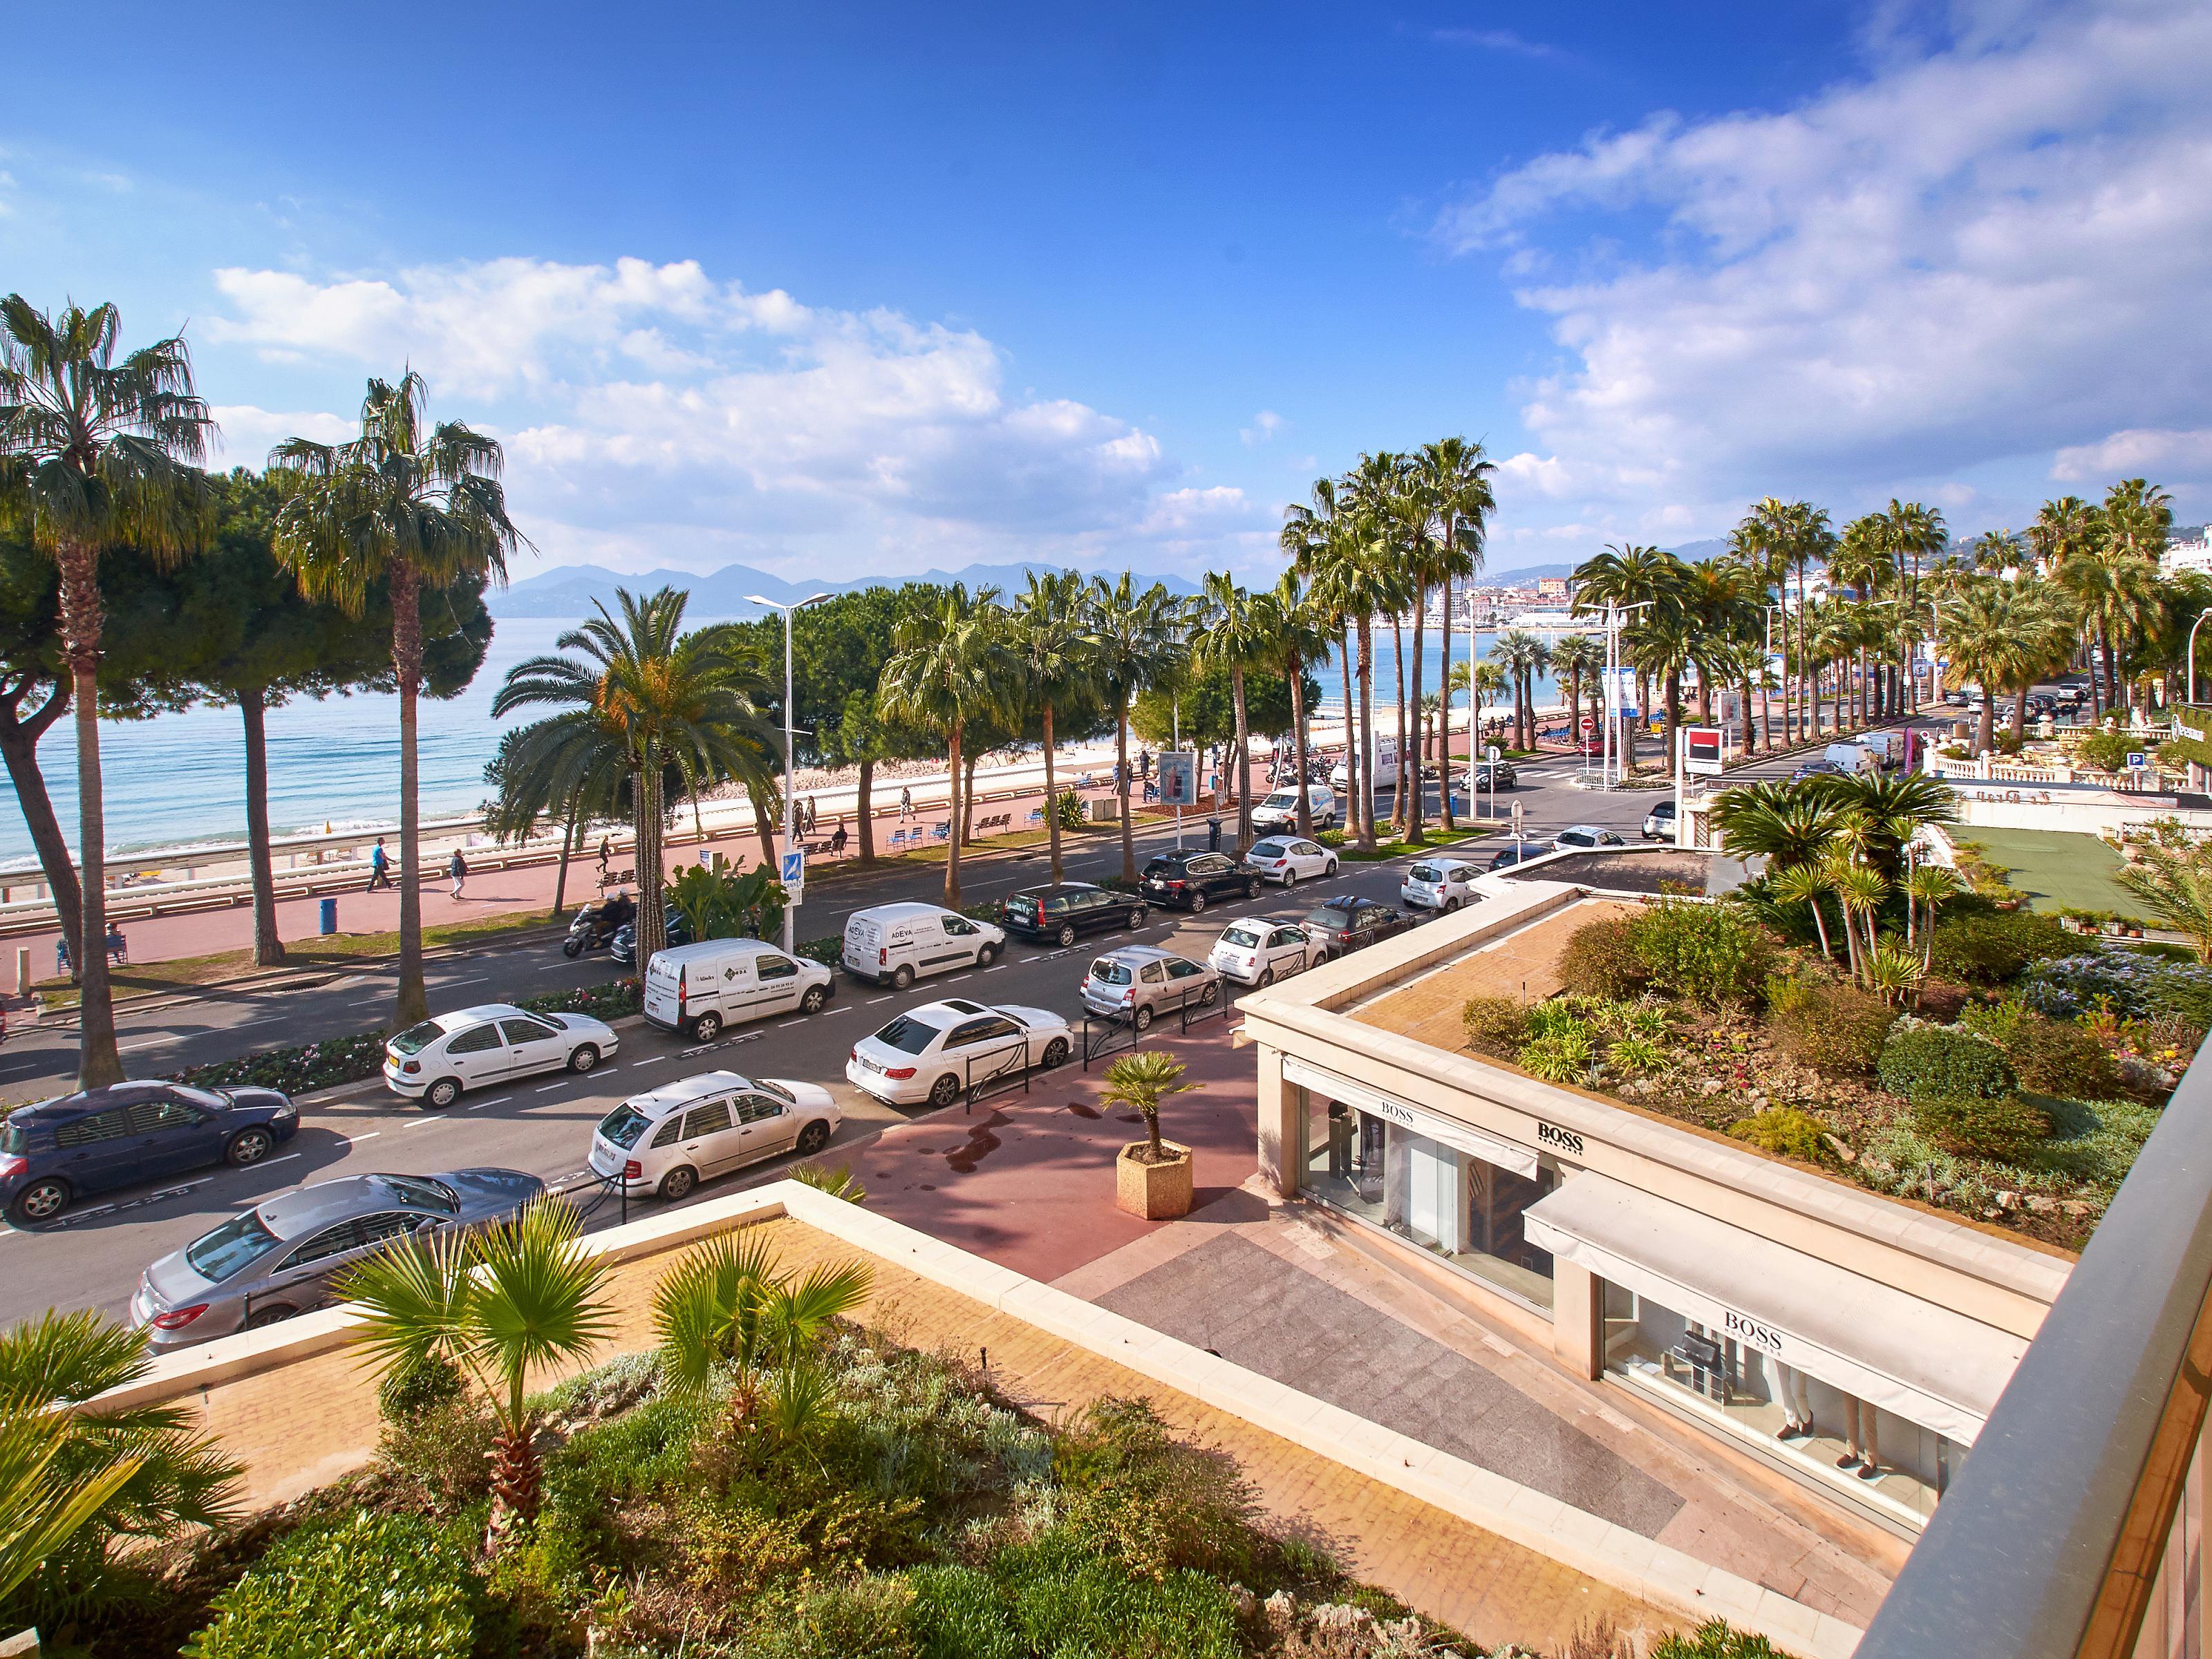 Apartamento por un Venta en Luxurious 3 roomed apartment with panoramic sea views Cannes, Provincia - Alpes - Costa Azul 06400 Francia